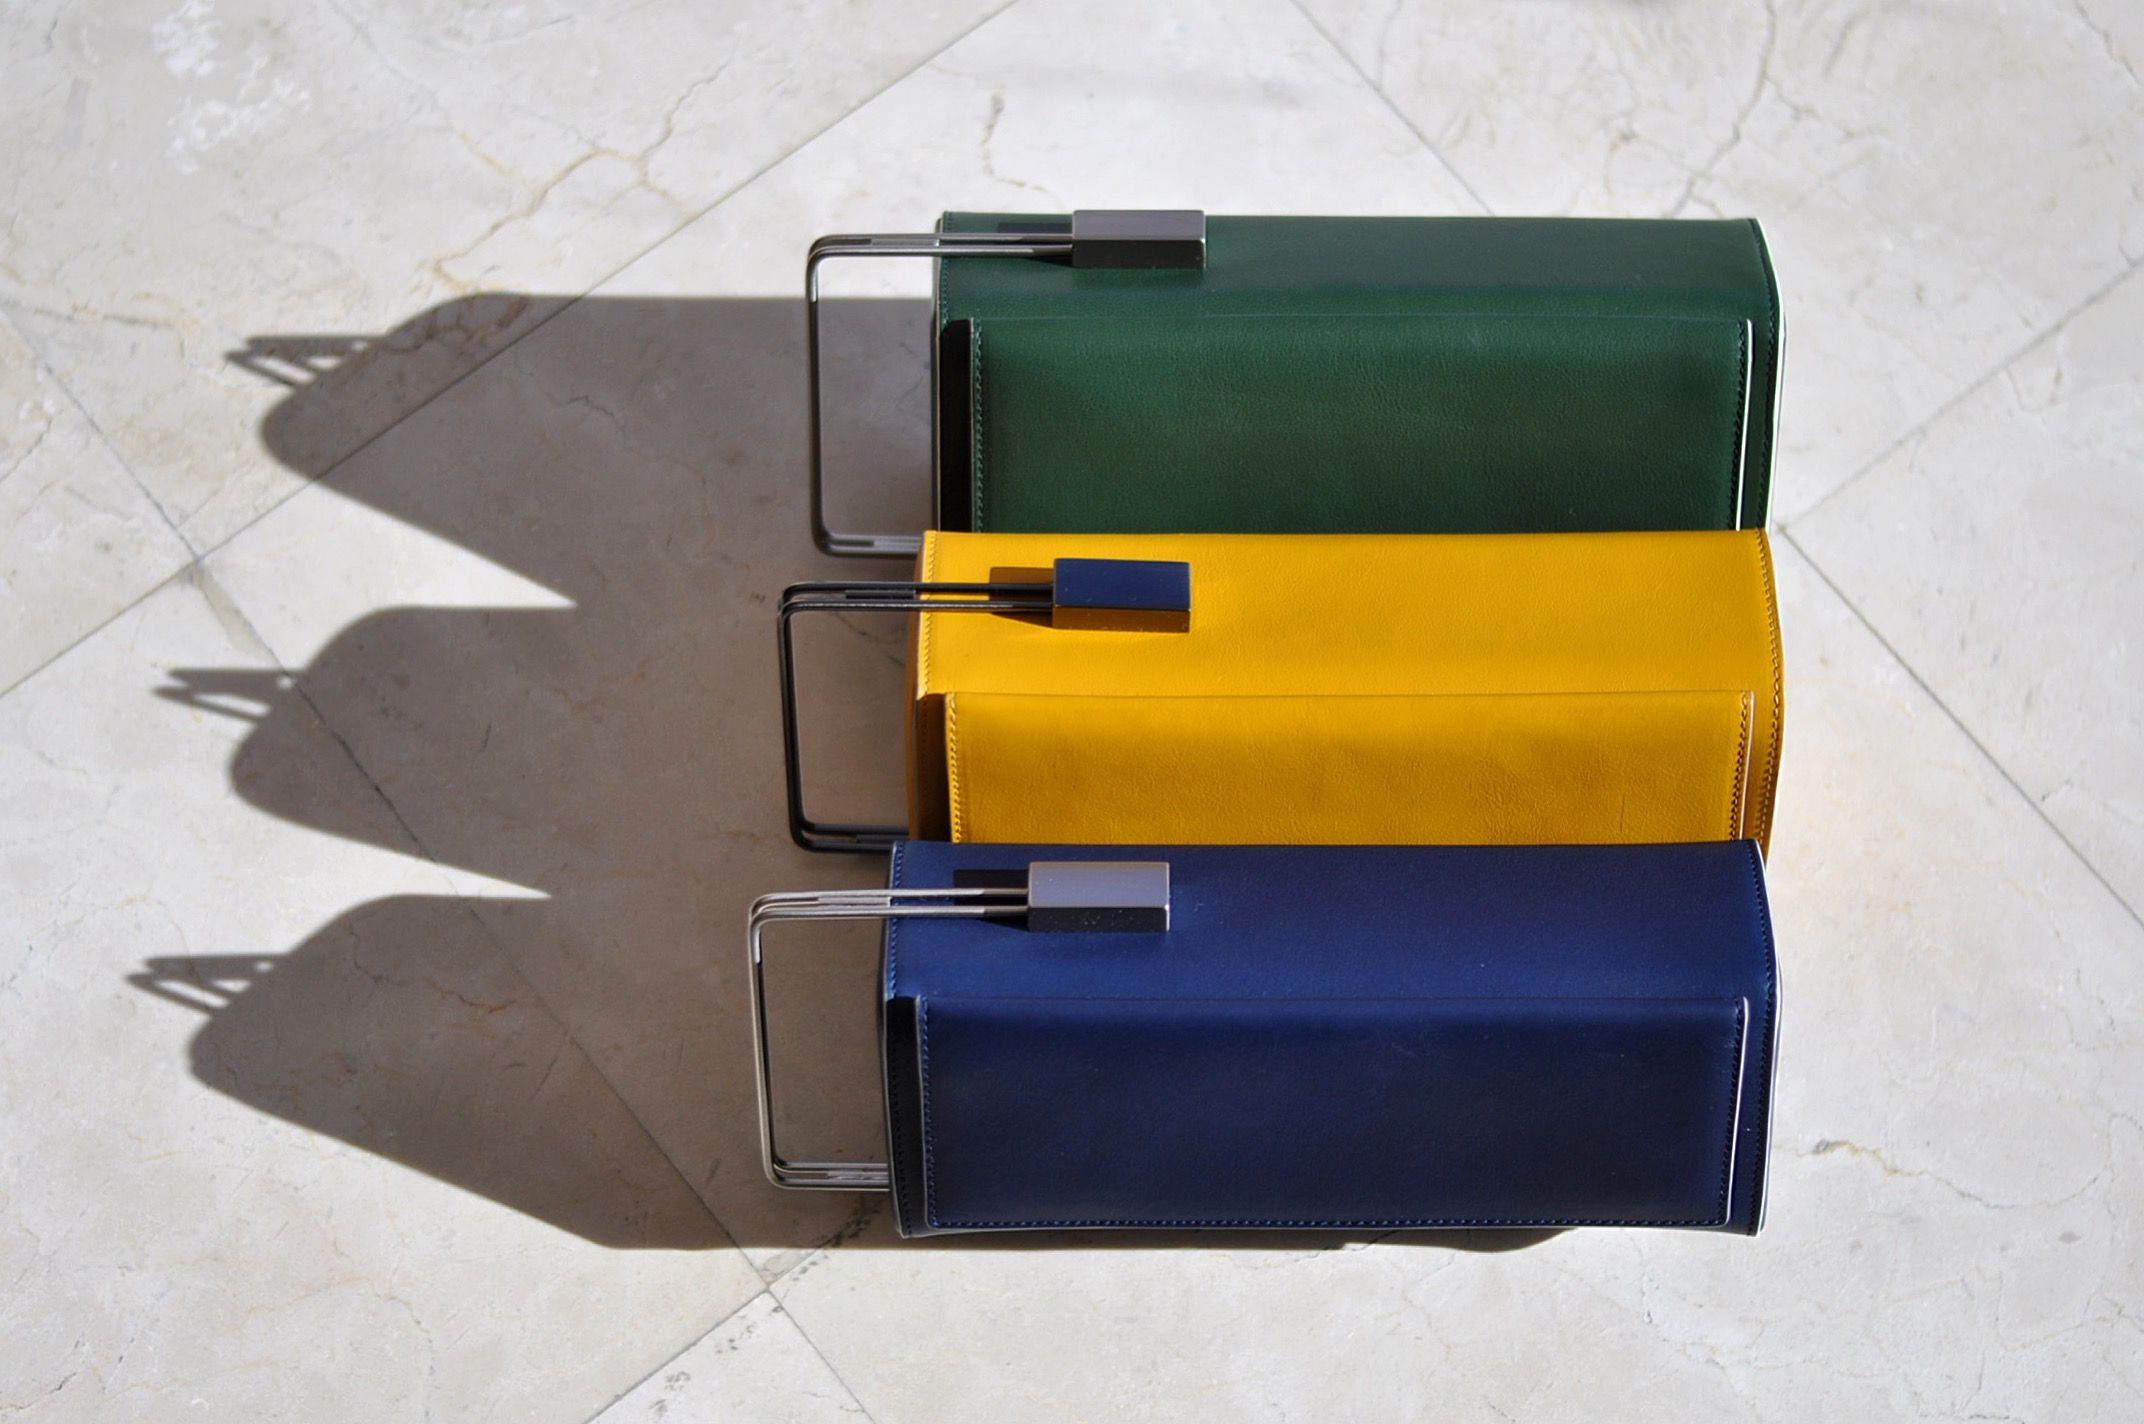 Night and Day Green, Yellow and Blue. #lautem #design #handbag #design Www.lautemofficial.com